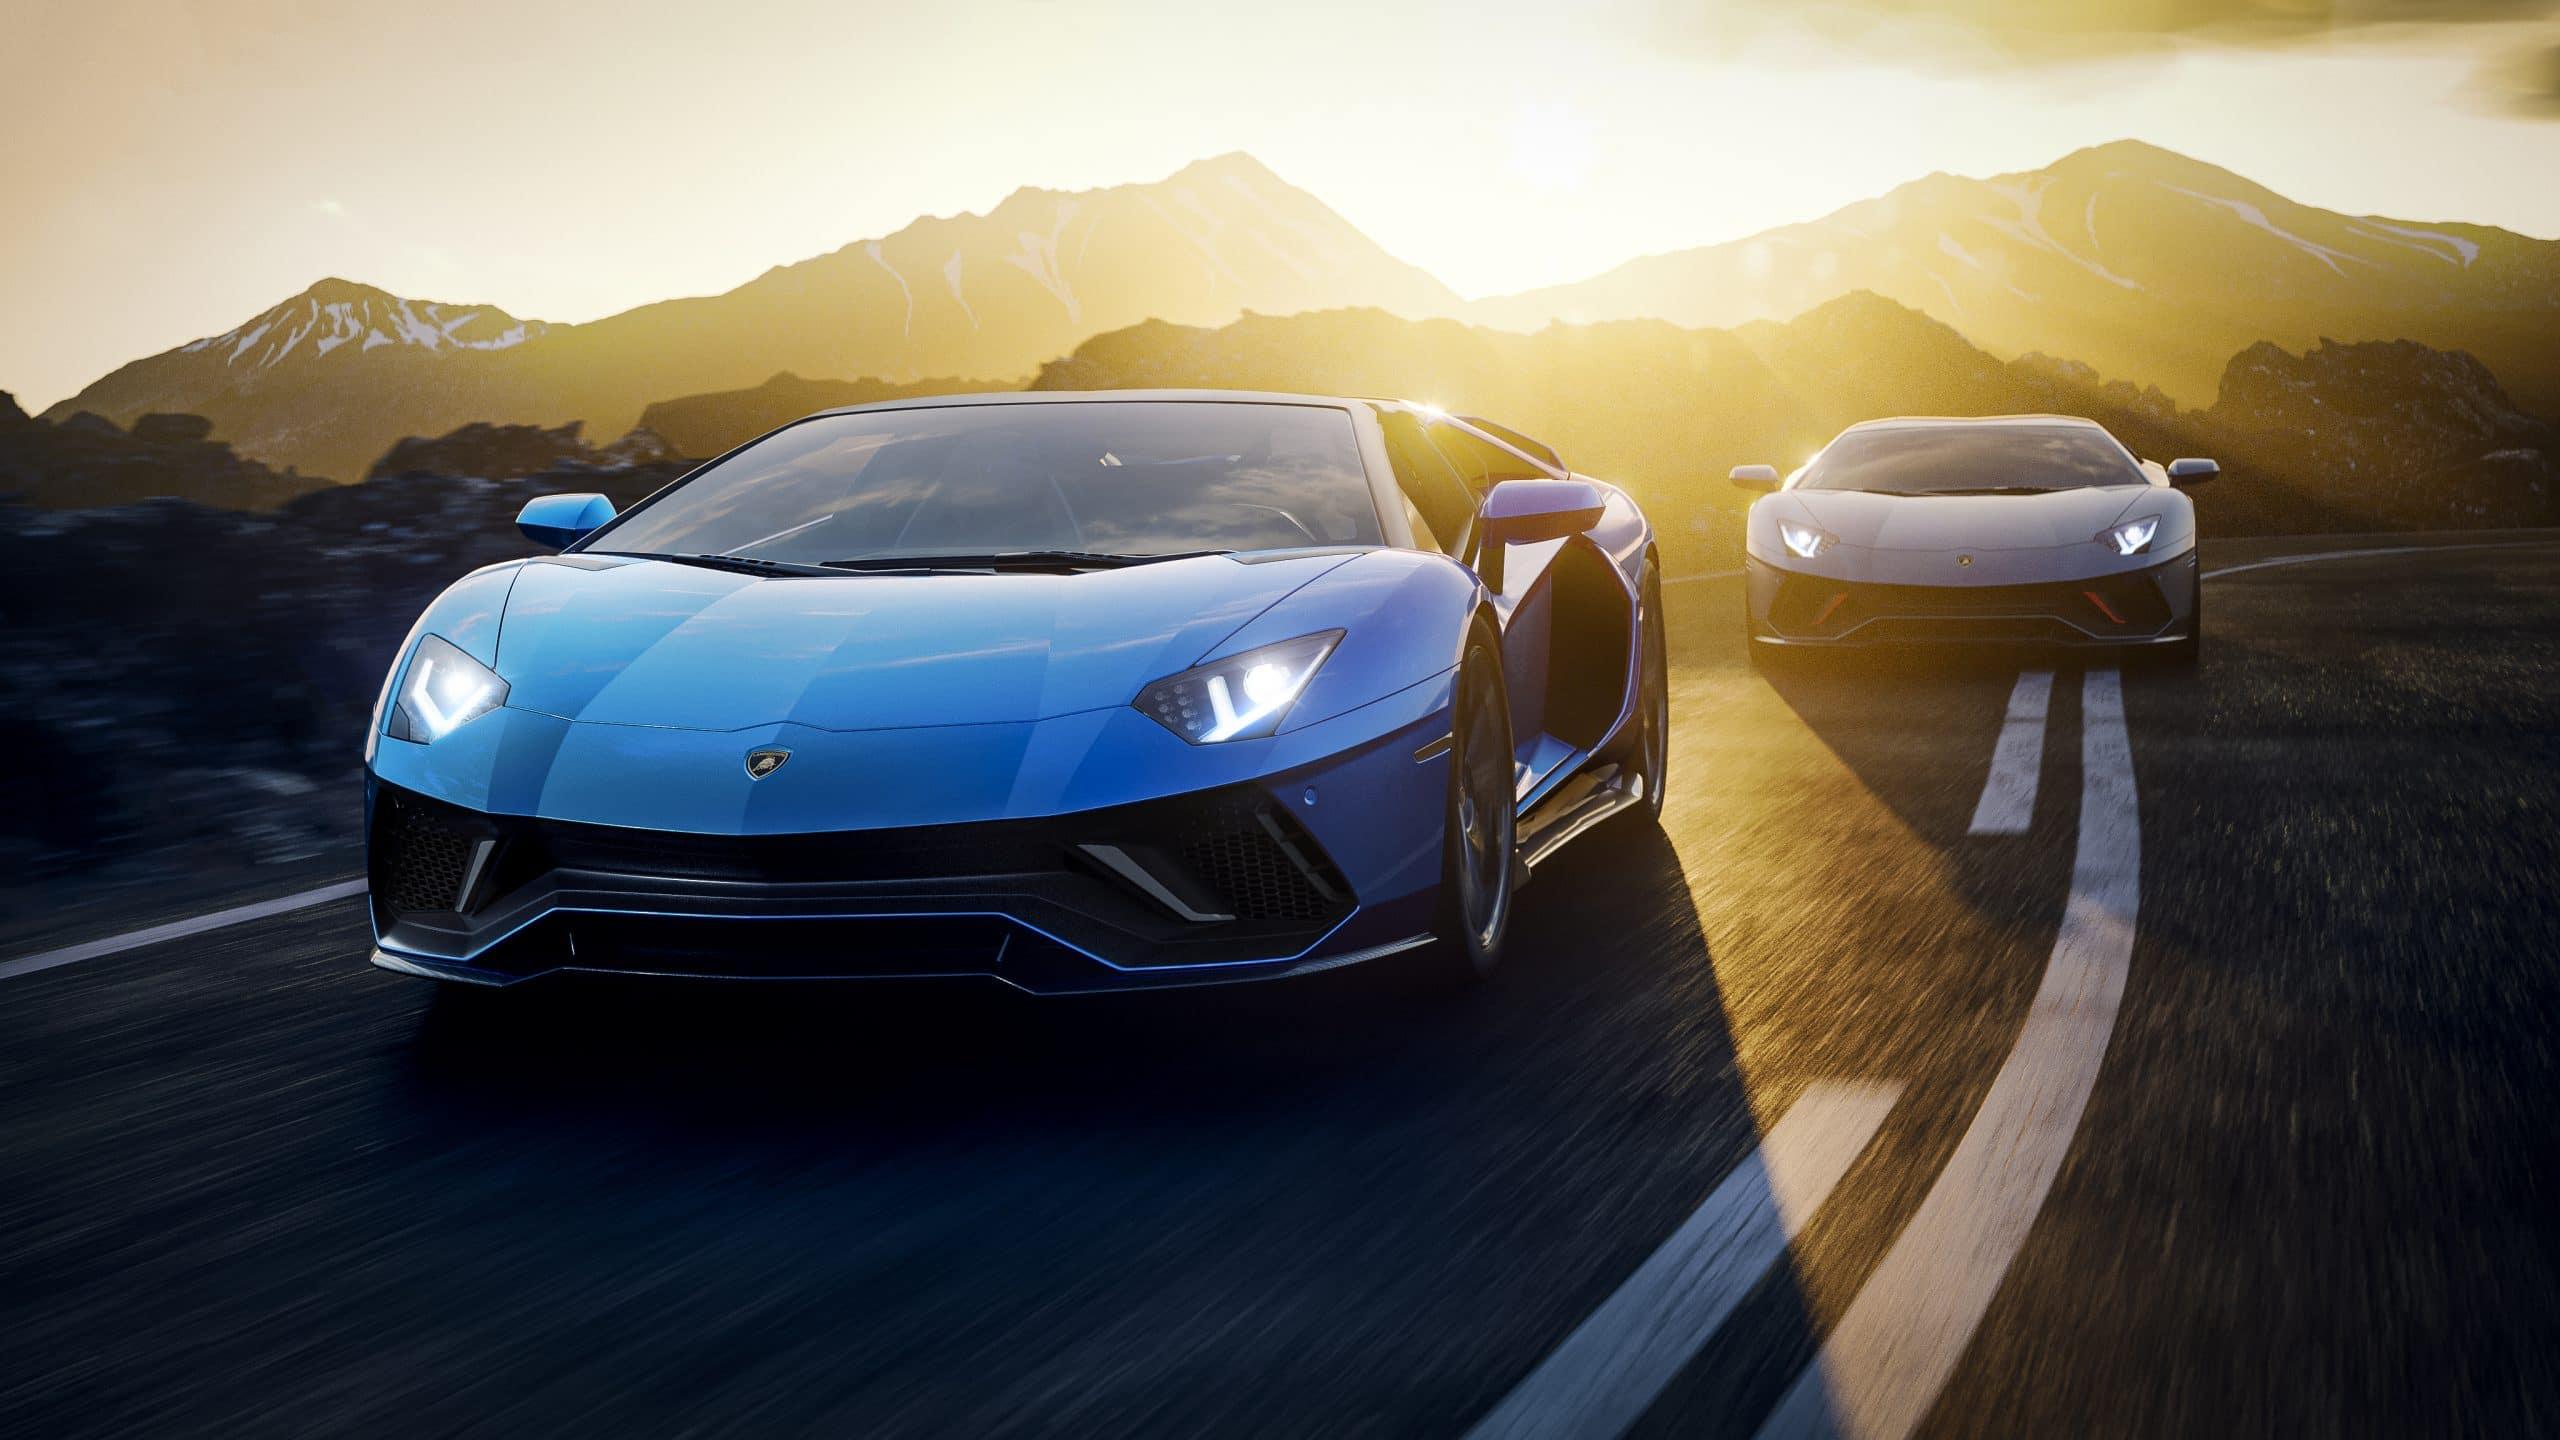 588368 scaled Lamborghini Aventador LP 780-4 Ultimae : Η τελευταία πράξη Lambo, Lamborghini, Lamborghini Aventador, Sunday, supercar, supercars, zblog, ειδήσεις, Νέα